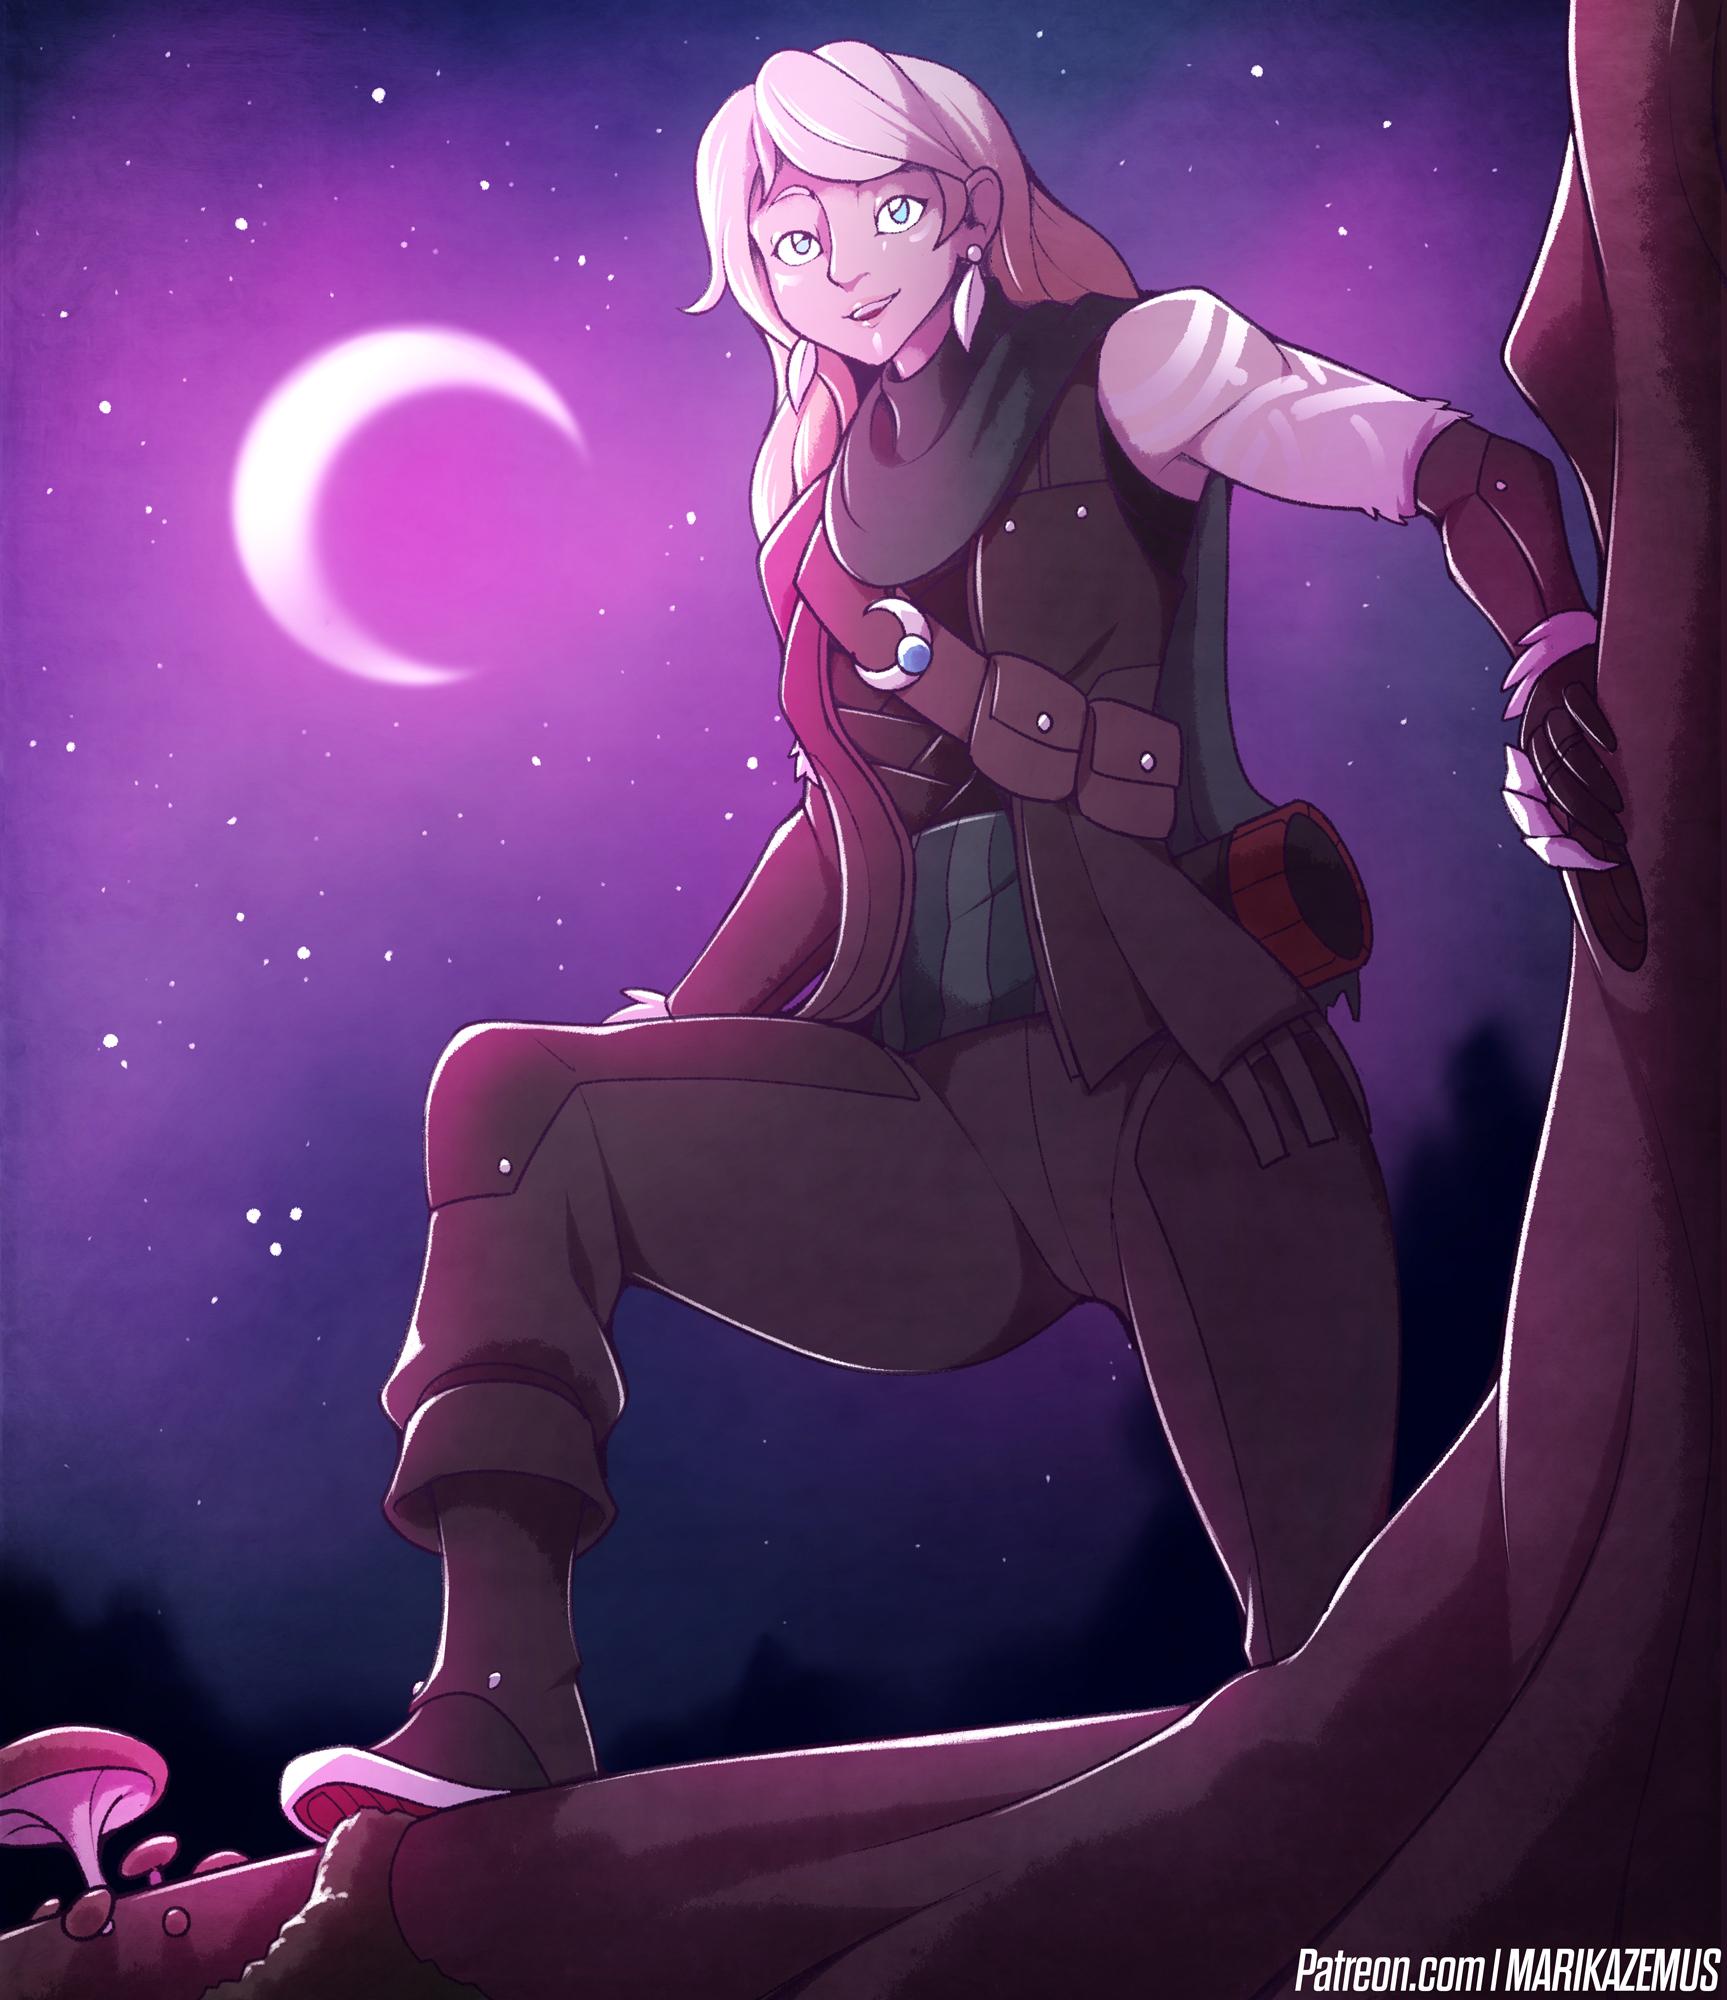 Magic Moonlight (Commission)